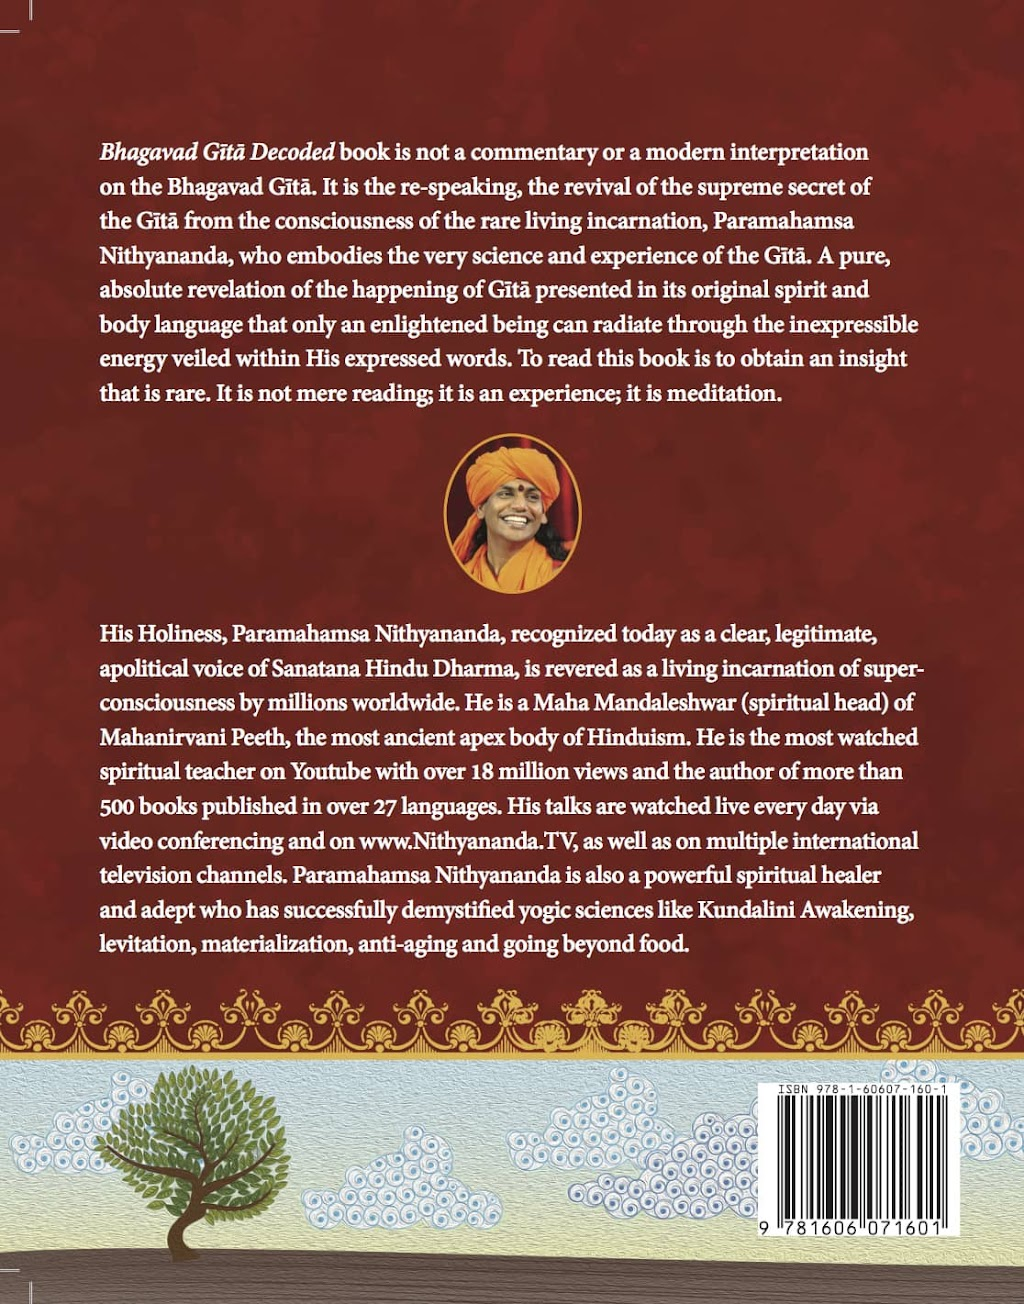 Bhagavad Gita Book - Thank You & Download